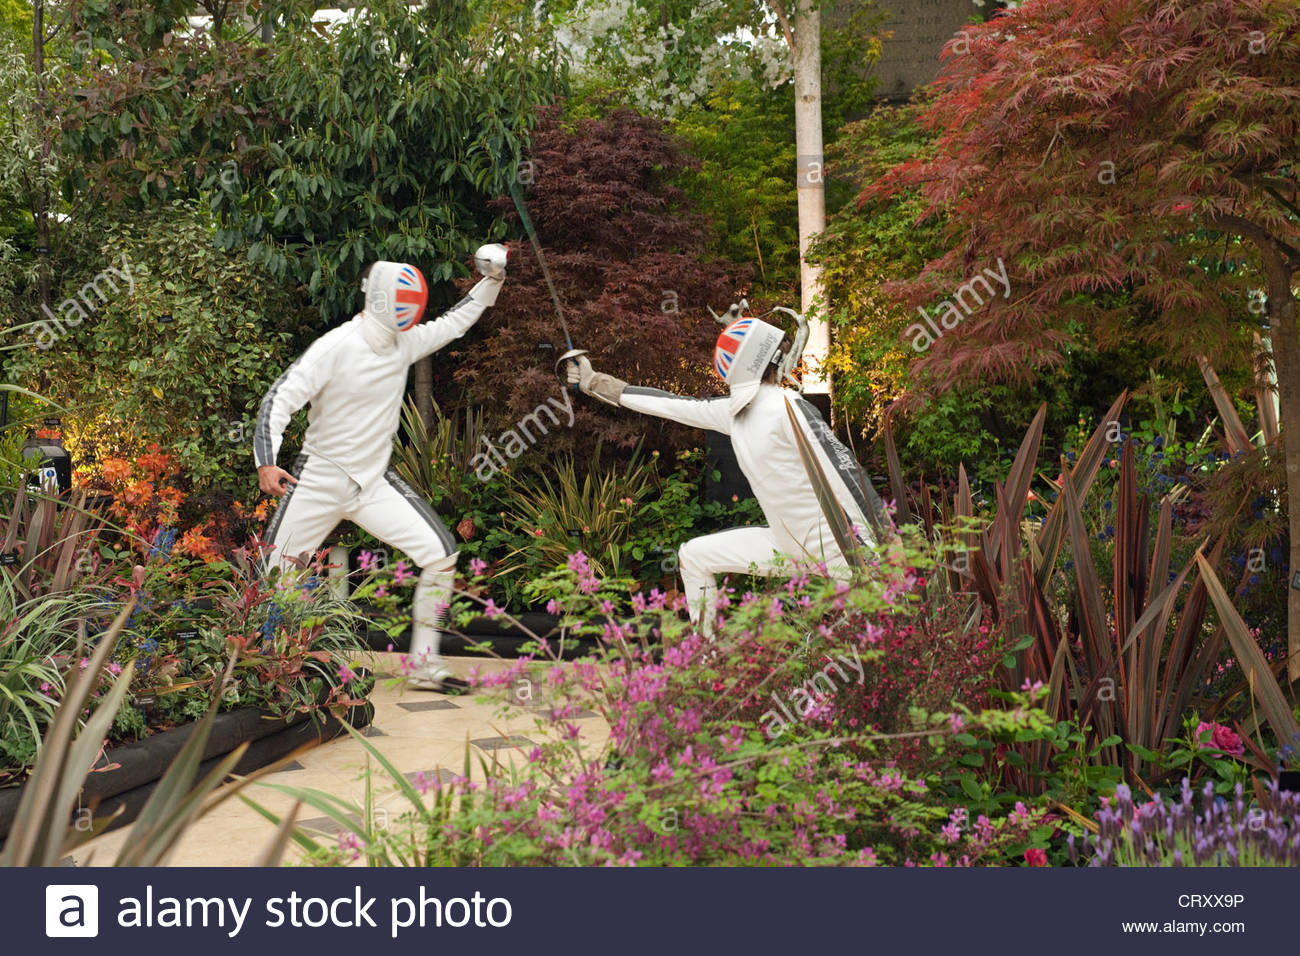 Hillier Viveros de duelo y la corona show garden en RHS Chelsea Flower Show 2012 Foto de stock